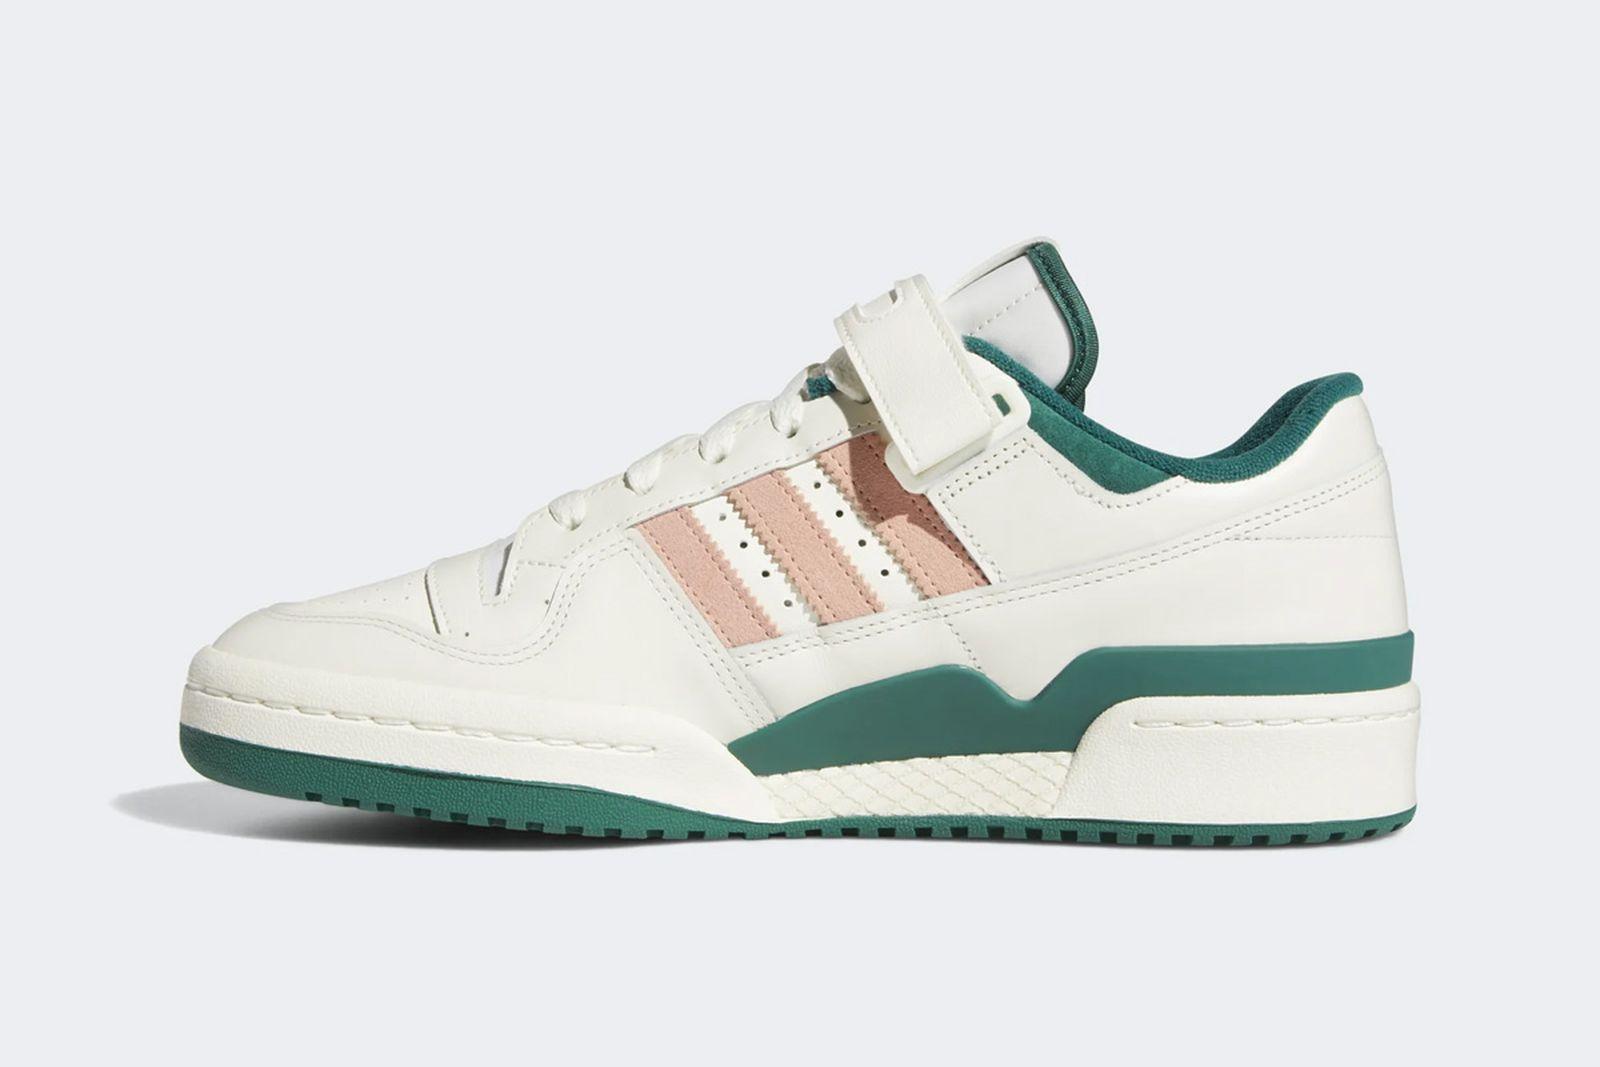 adidas-originals-forum-low-watermelon-release-date-price-01